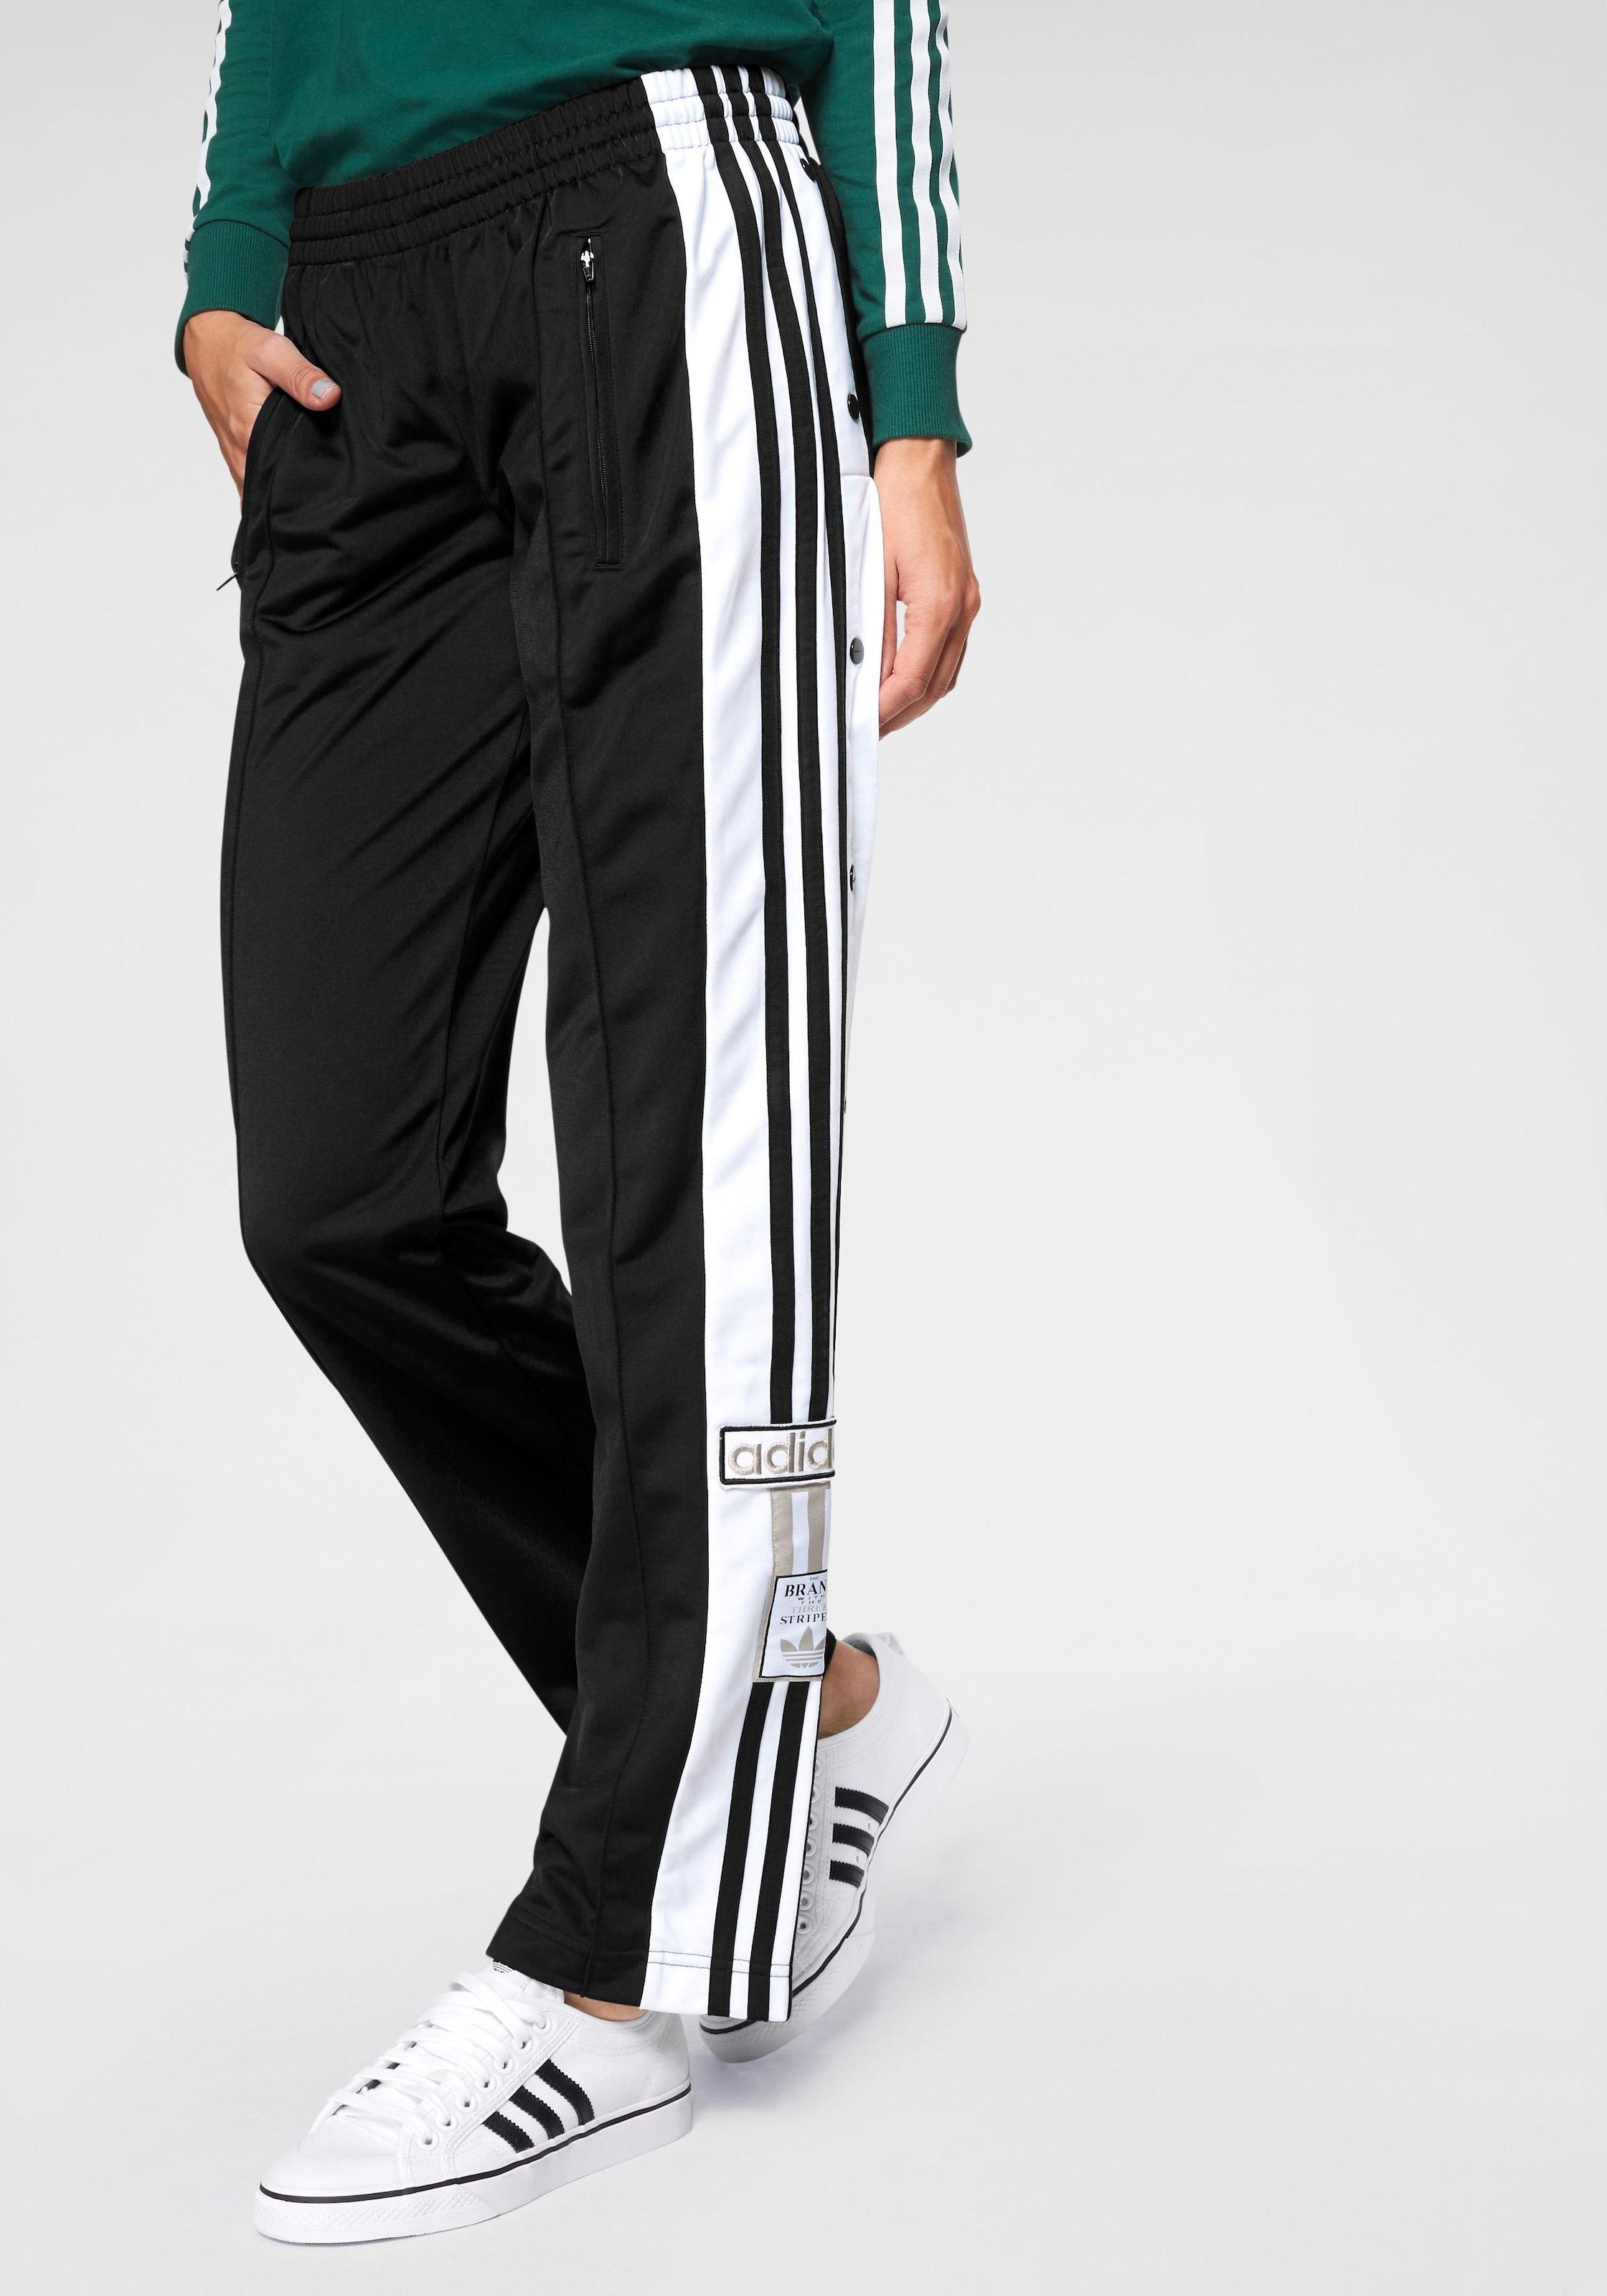 adidas Originals Trainingshose »ADIBREAK PANT« auf Rechnung bestellen | BAUR